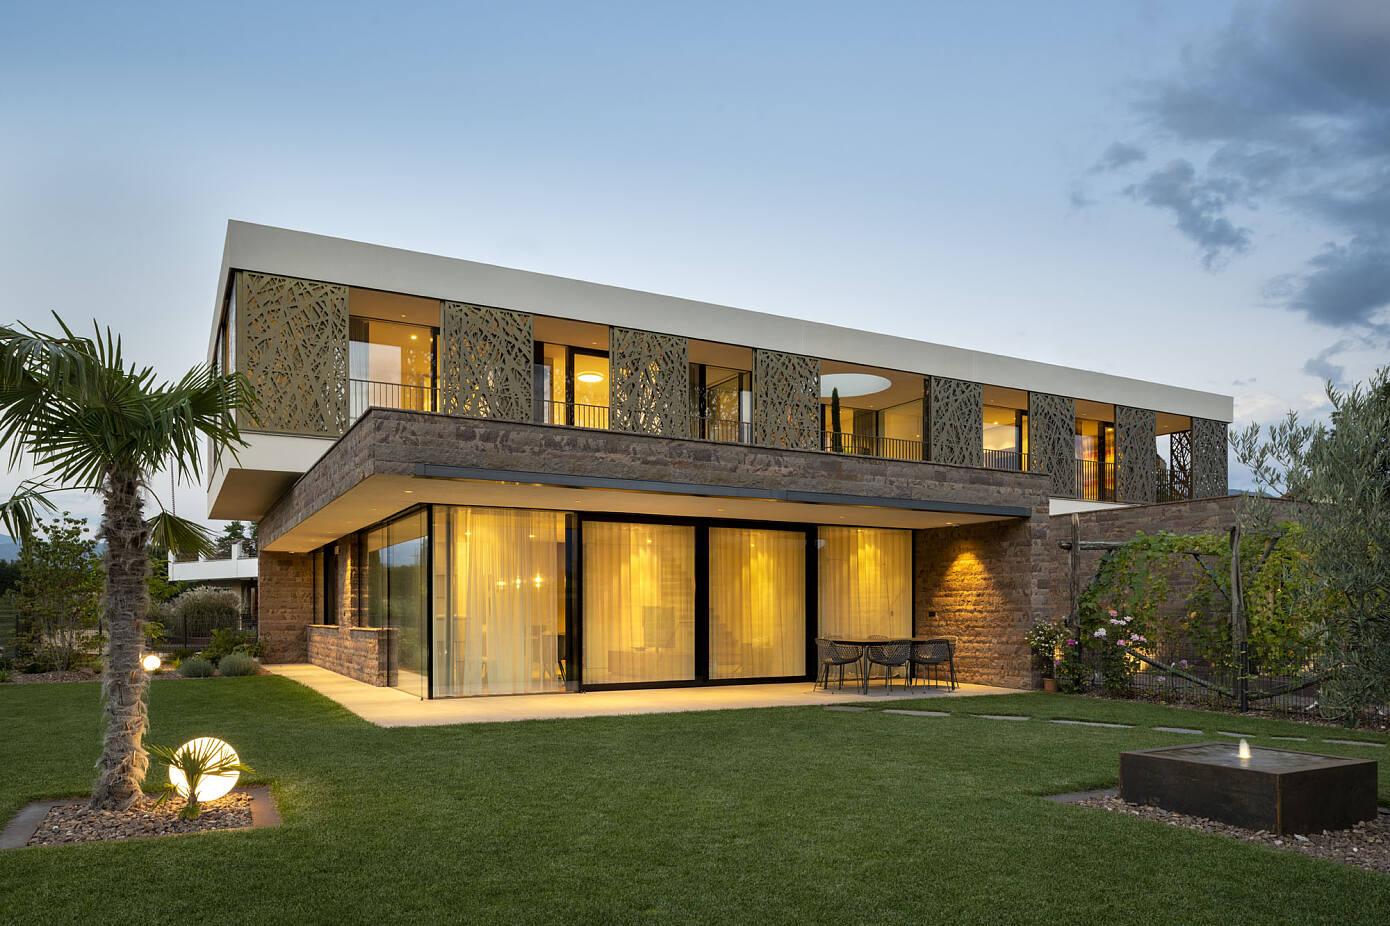 House P2 by Monovolume Architecture + Design